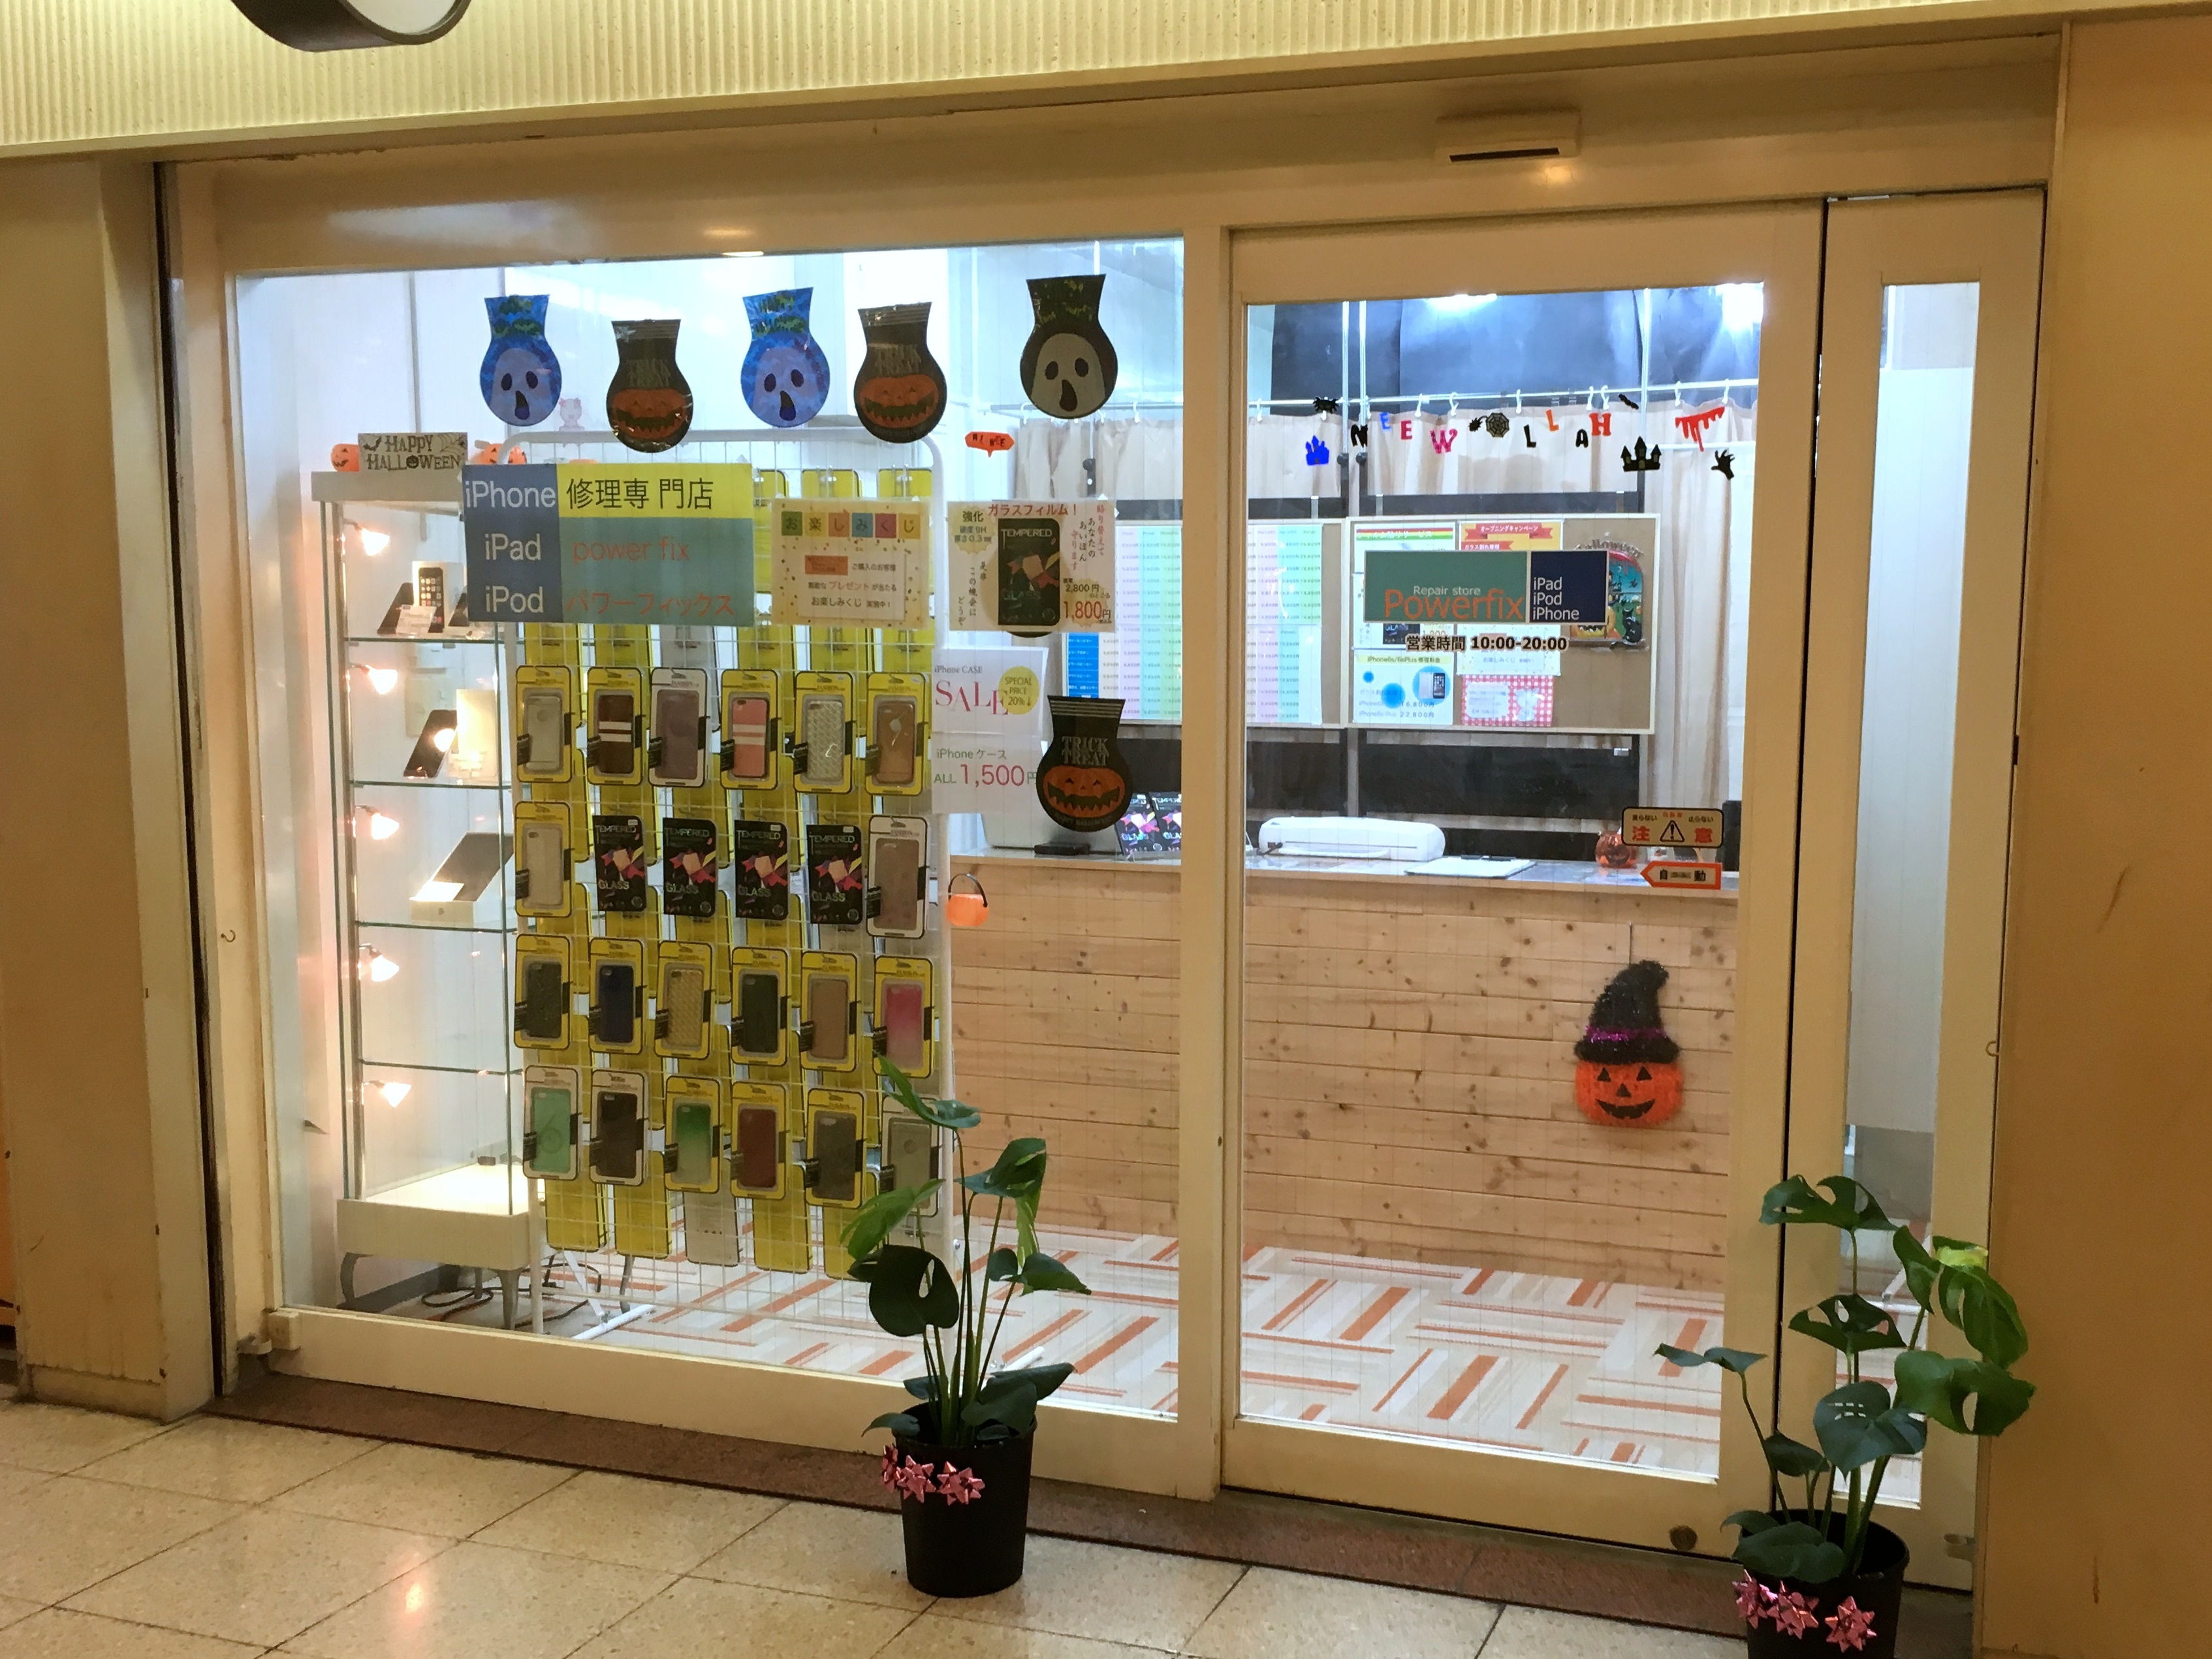 iPhone修理専門店パワーフィックス大阪梅田店